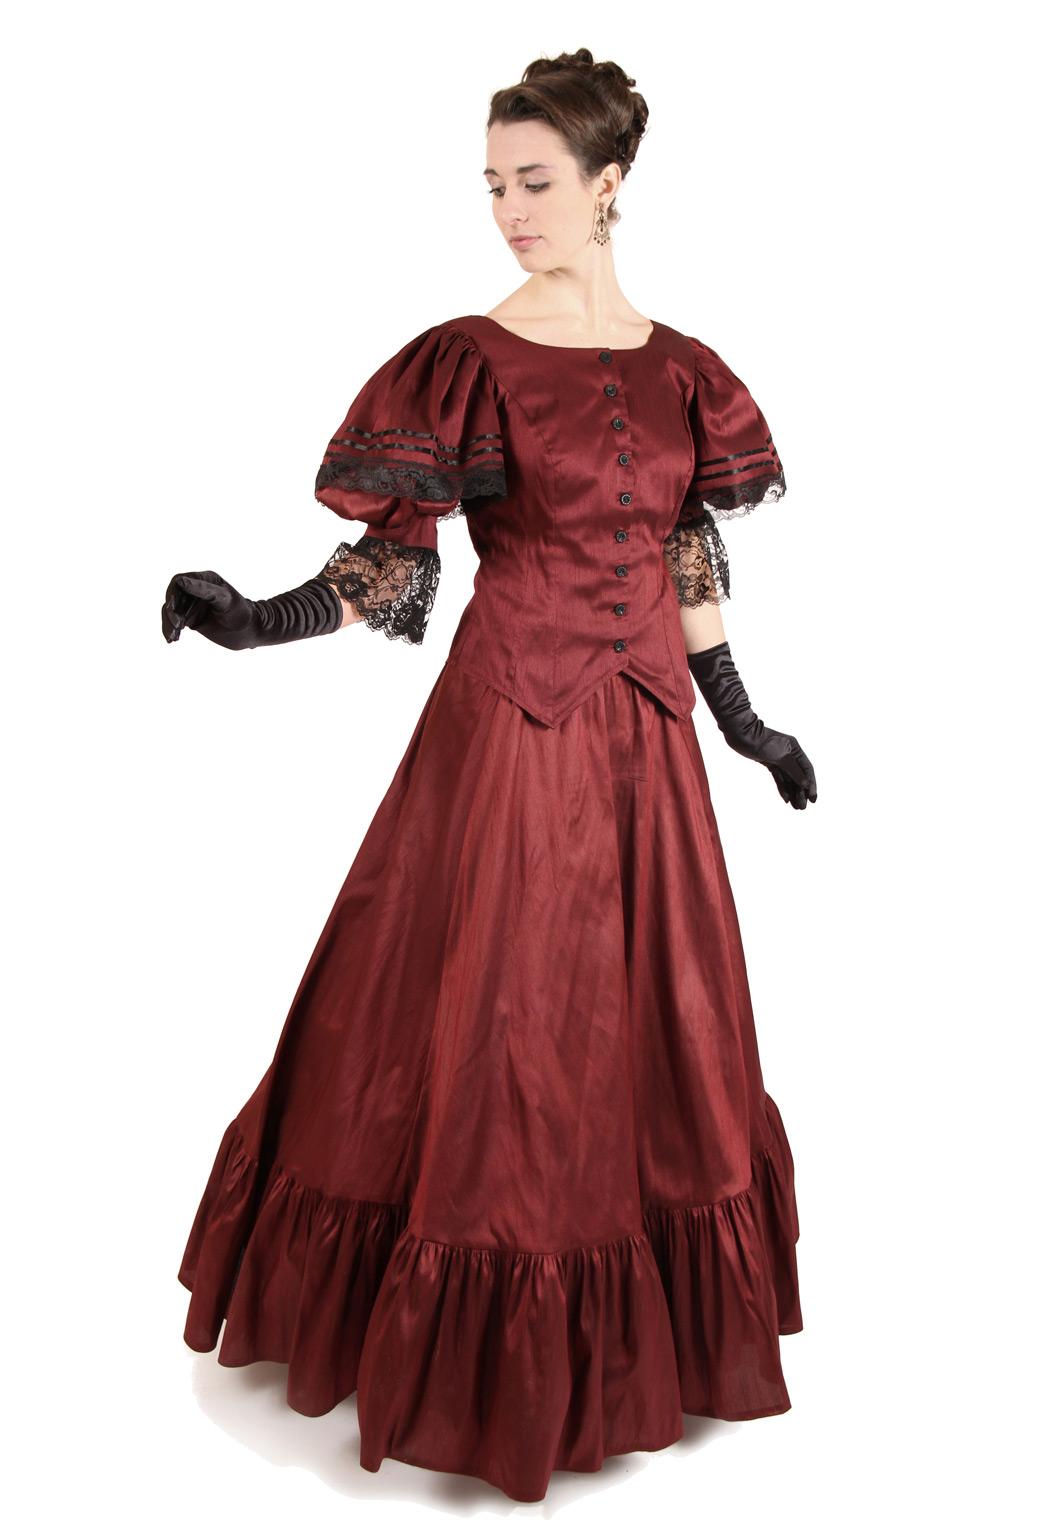 Victorian Fashion Dresses